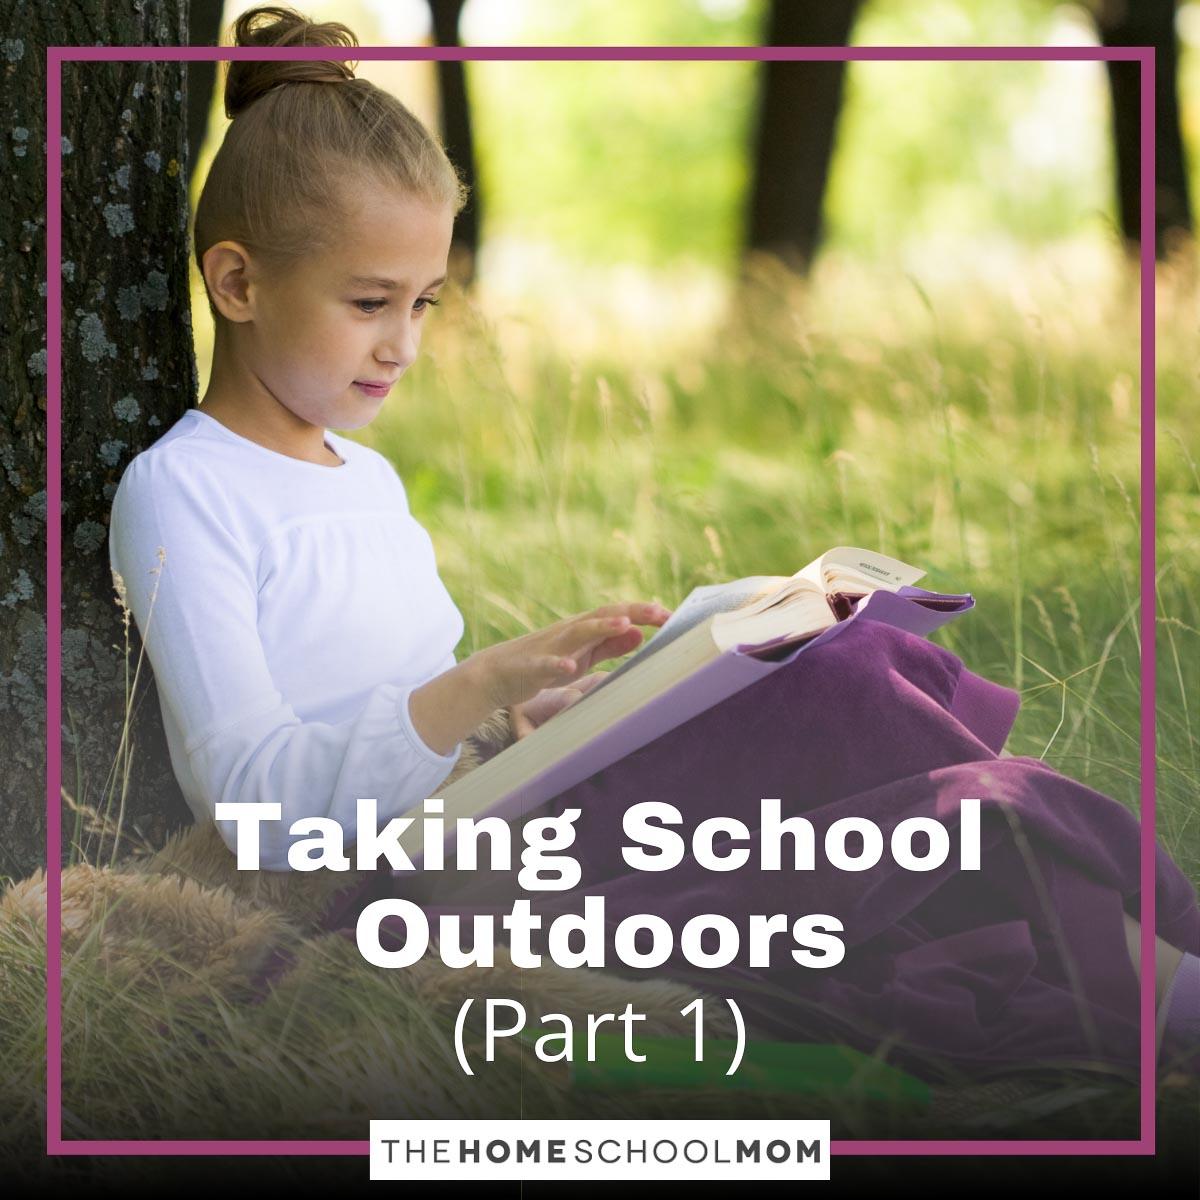 Taking School Outdoors Part 1